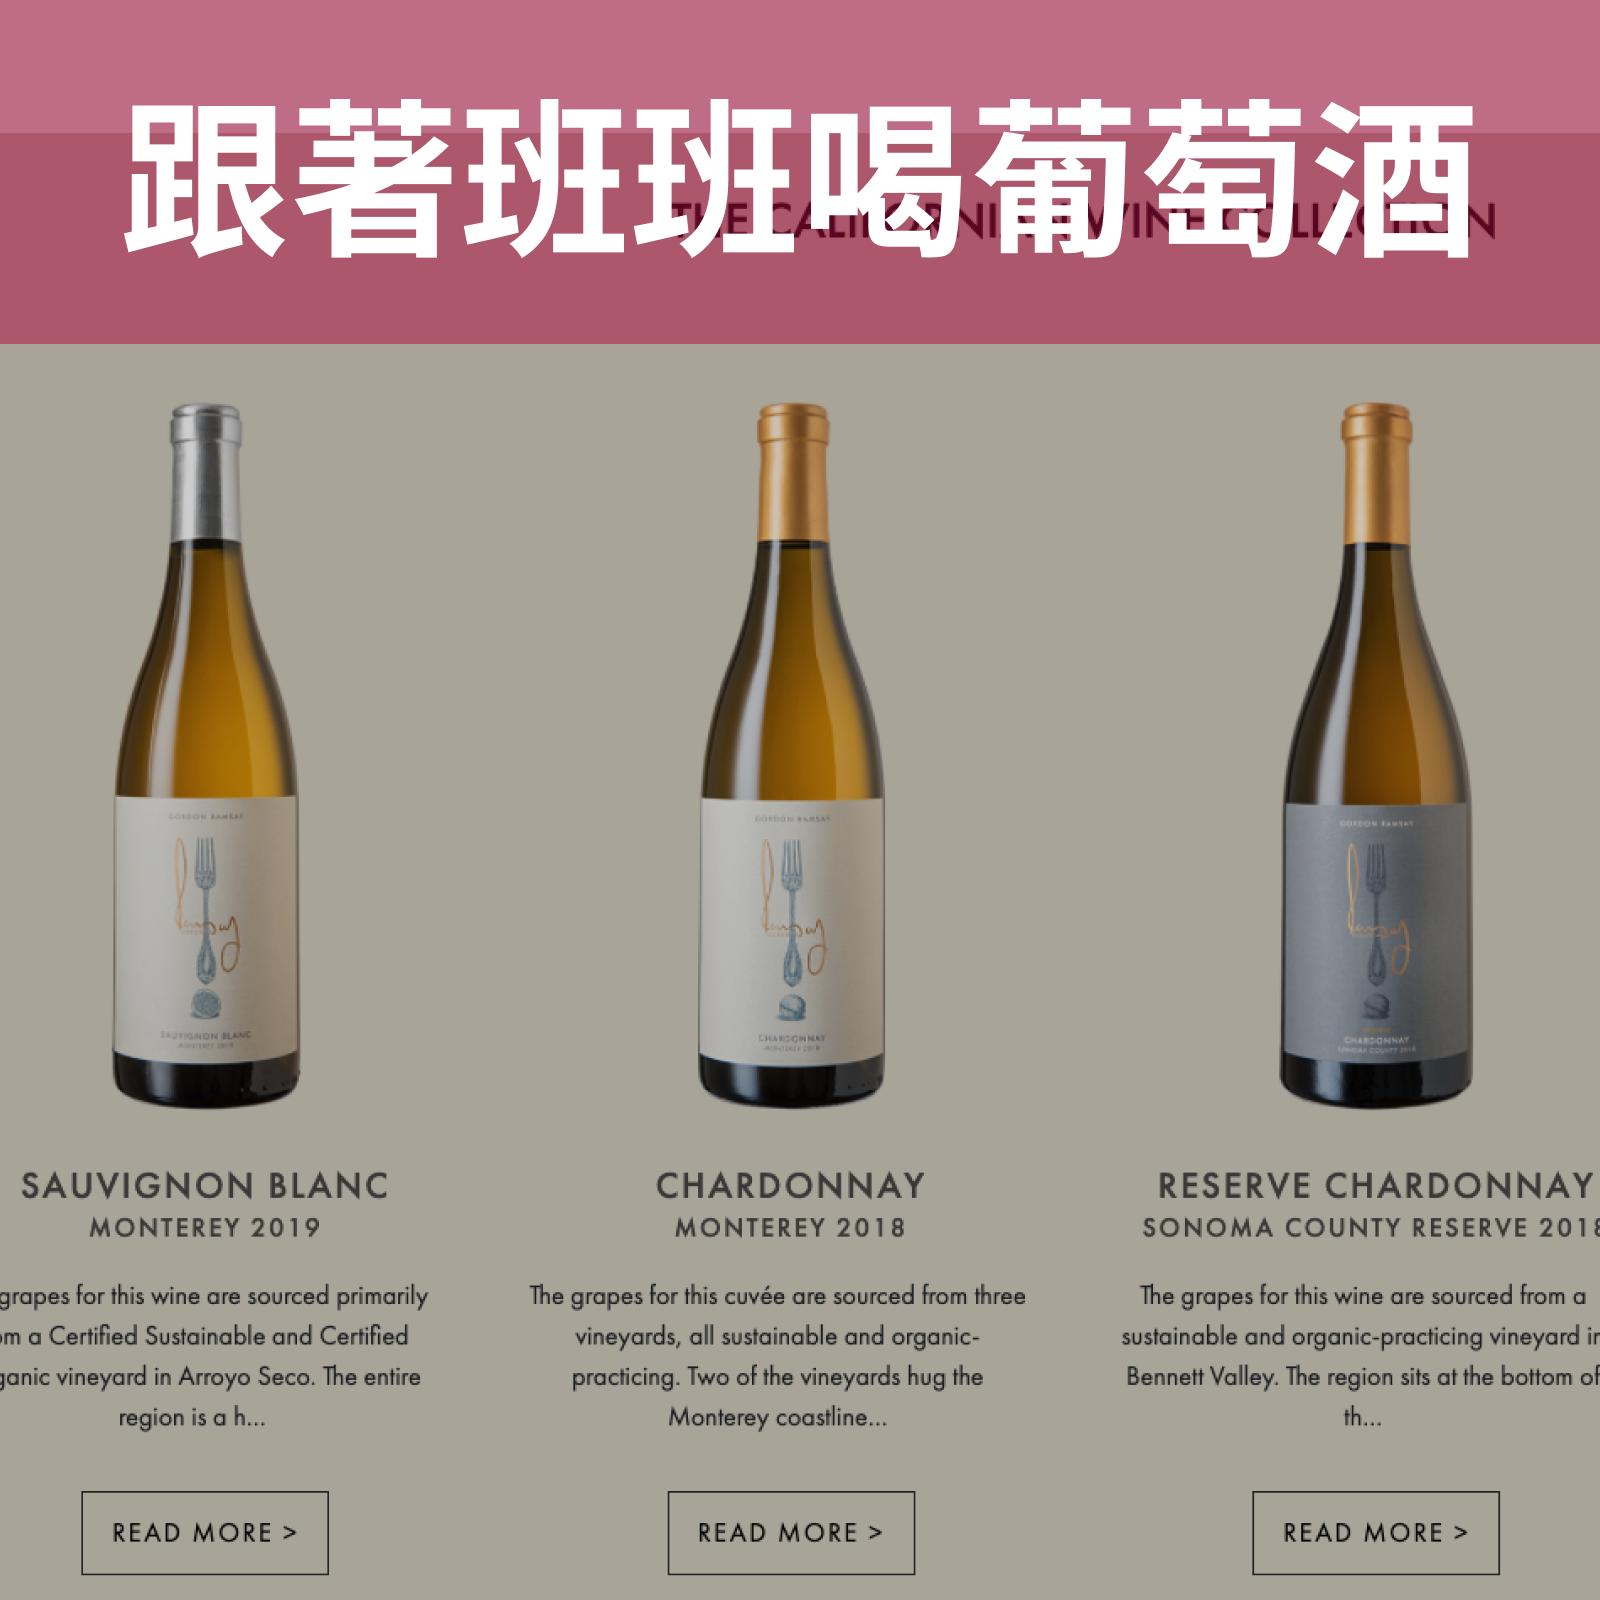 EP19   從地獄廚神 Gordon Ramsay 的自有葡萄酒品牌認識品種風味(上)